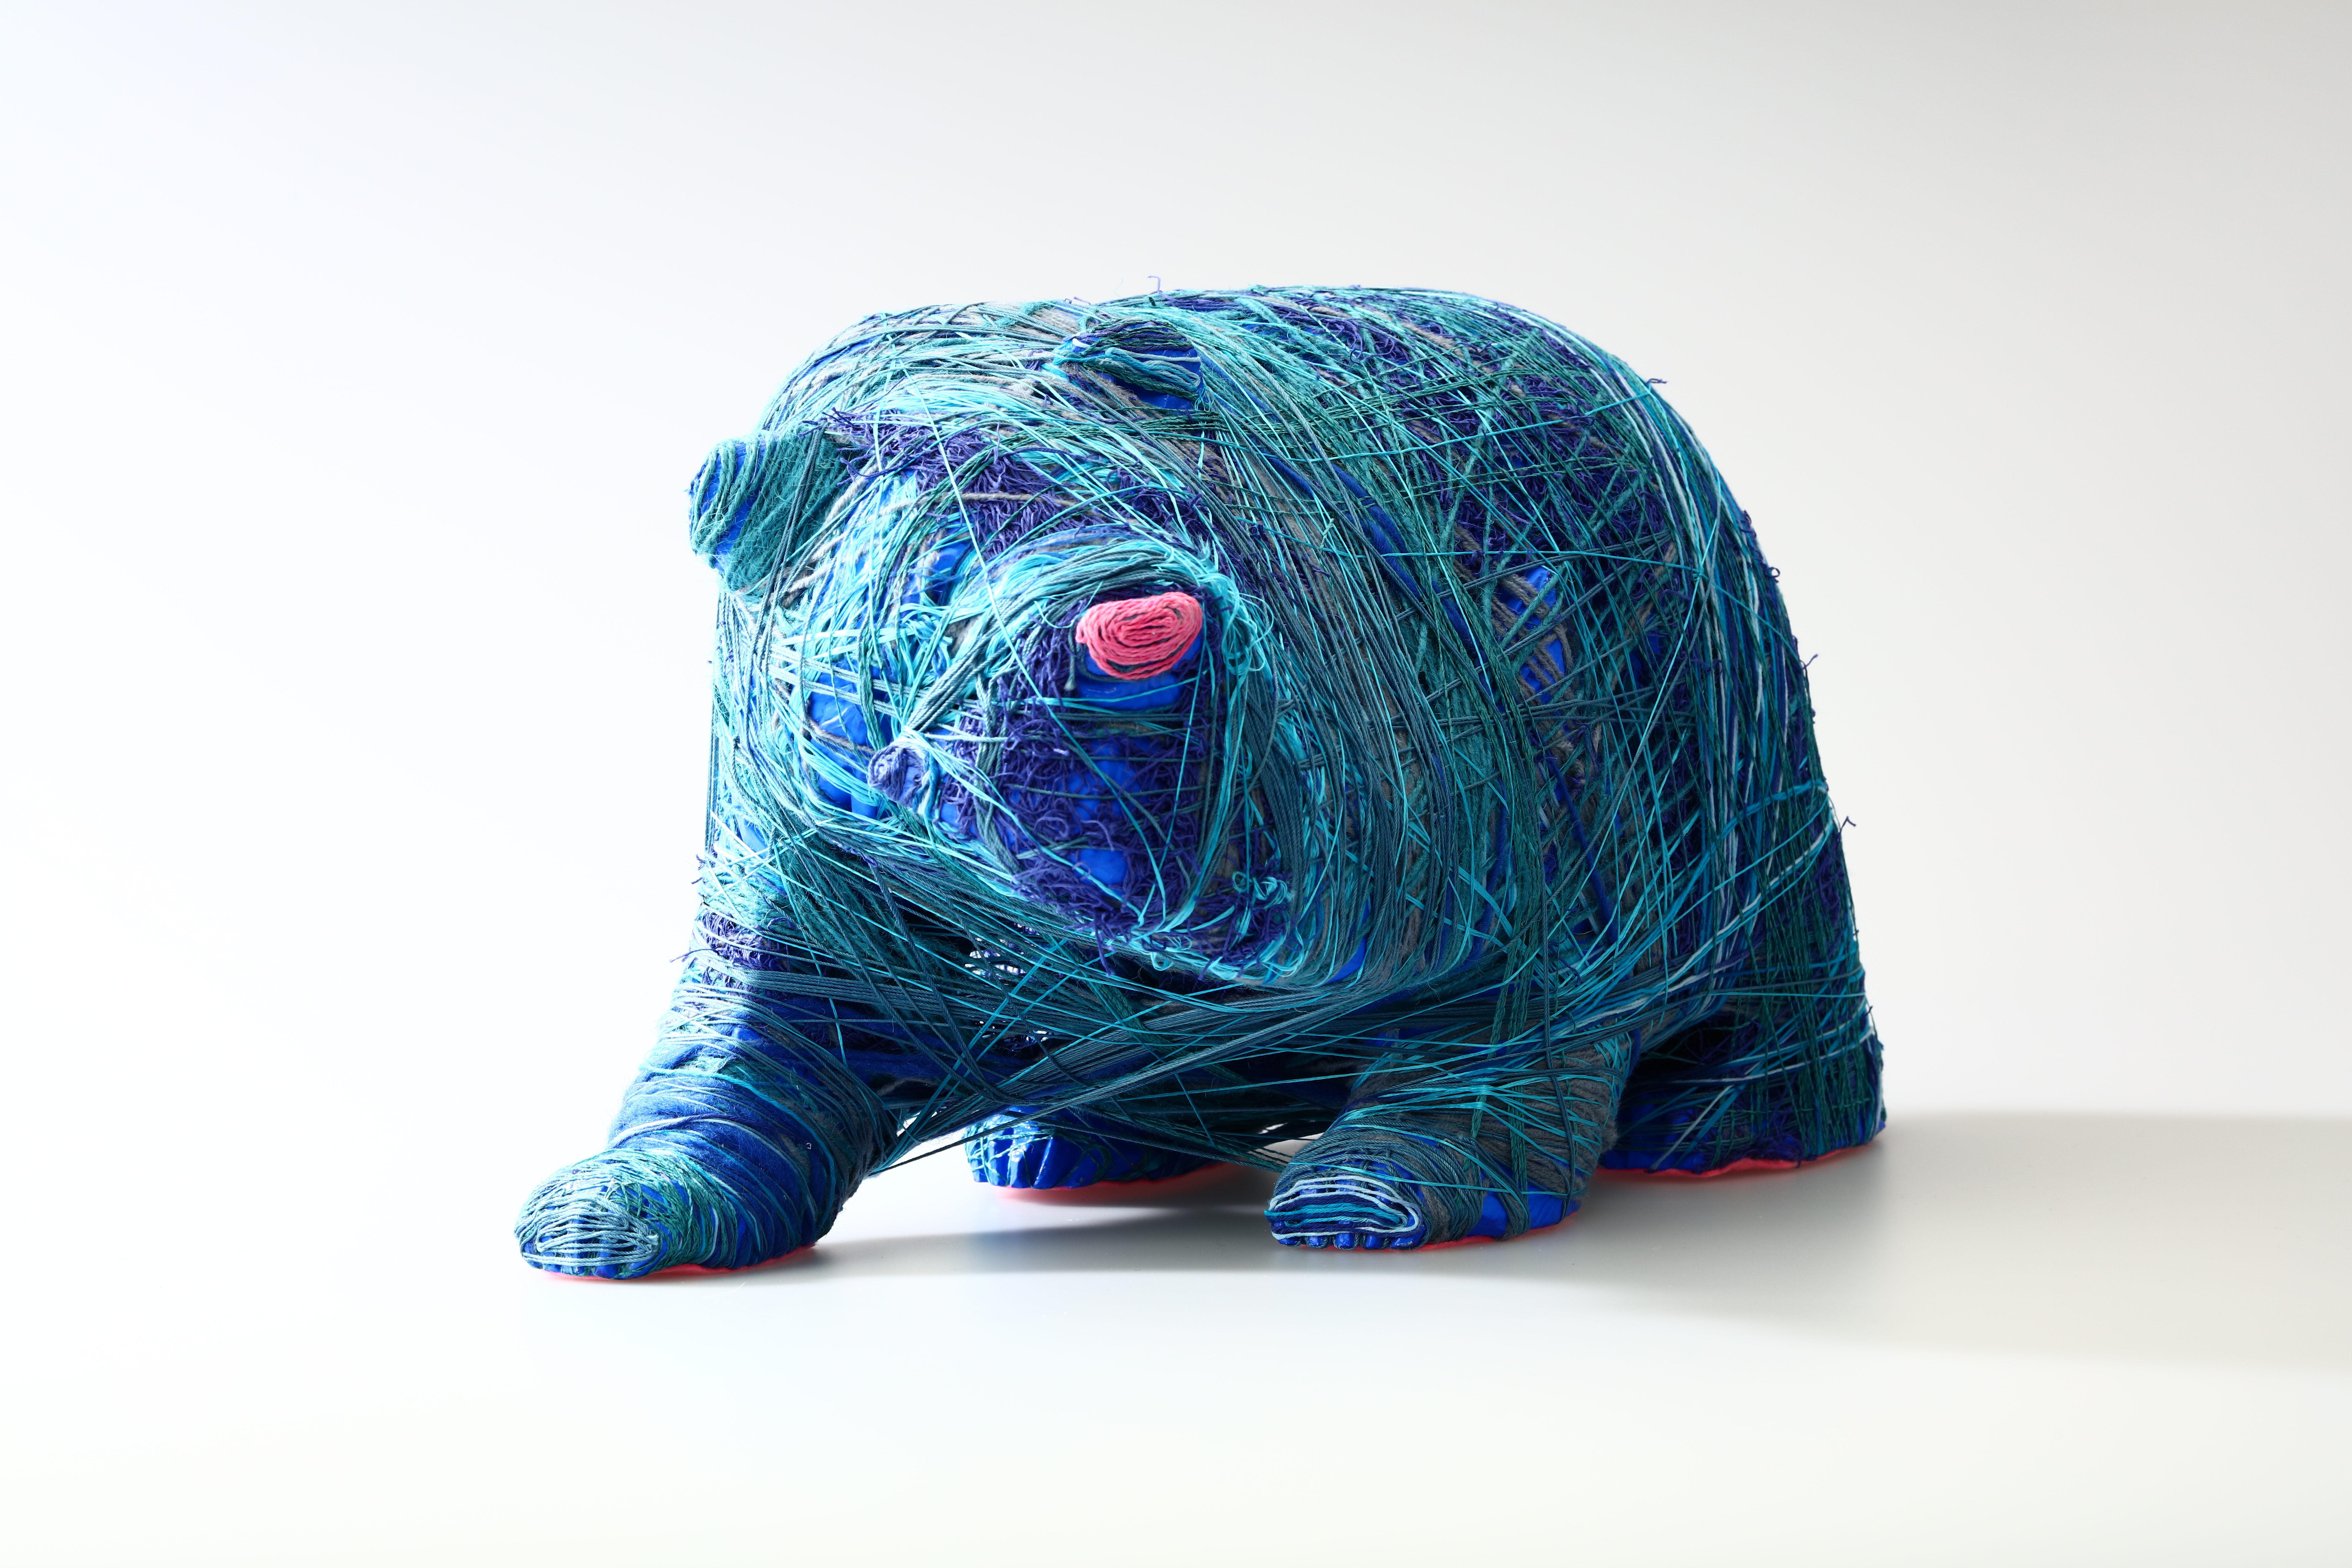 Re-Bear 2021 by Rentaro Kawamoto